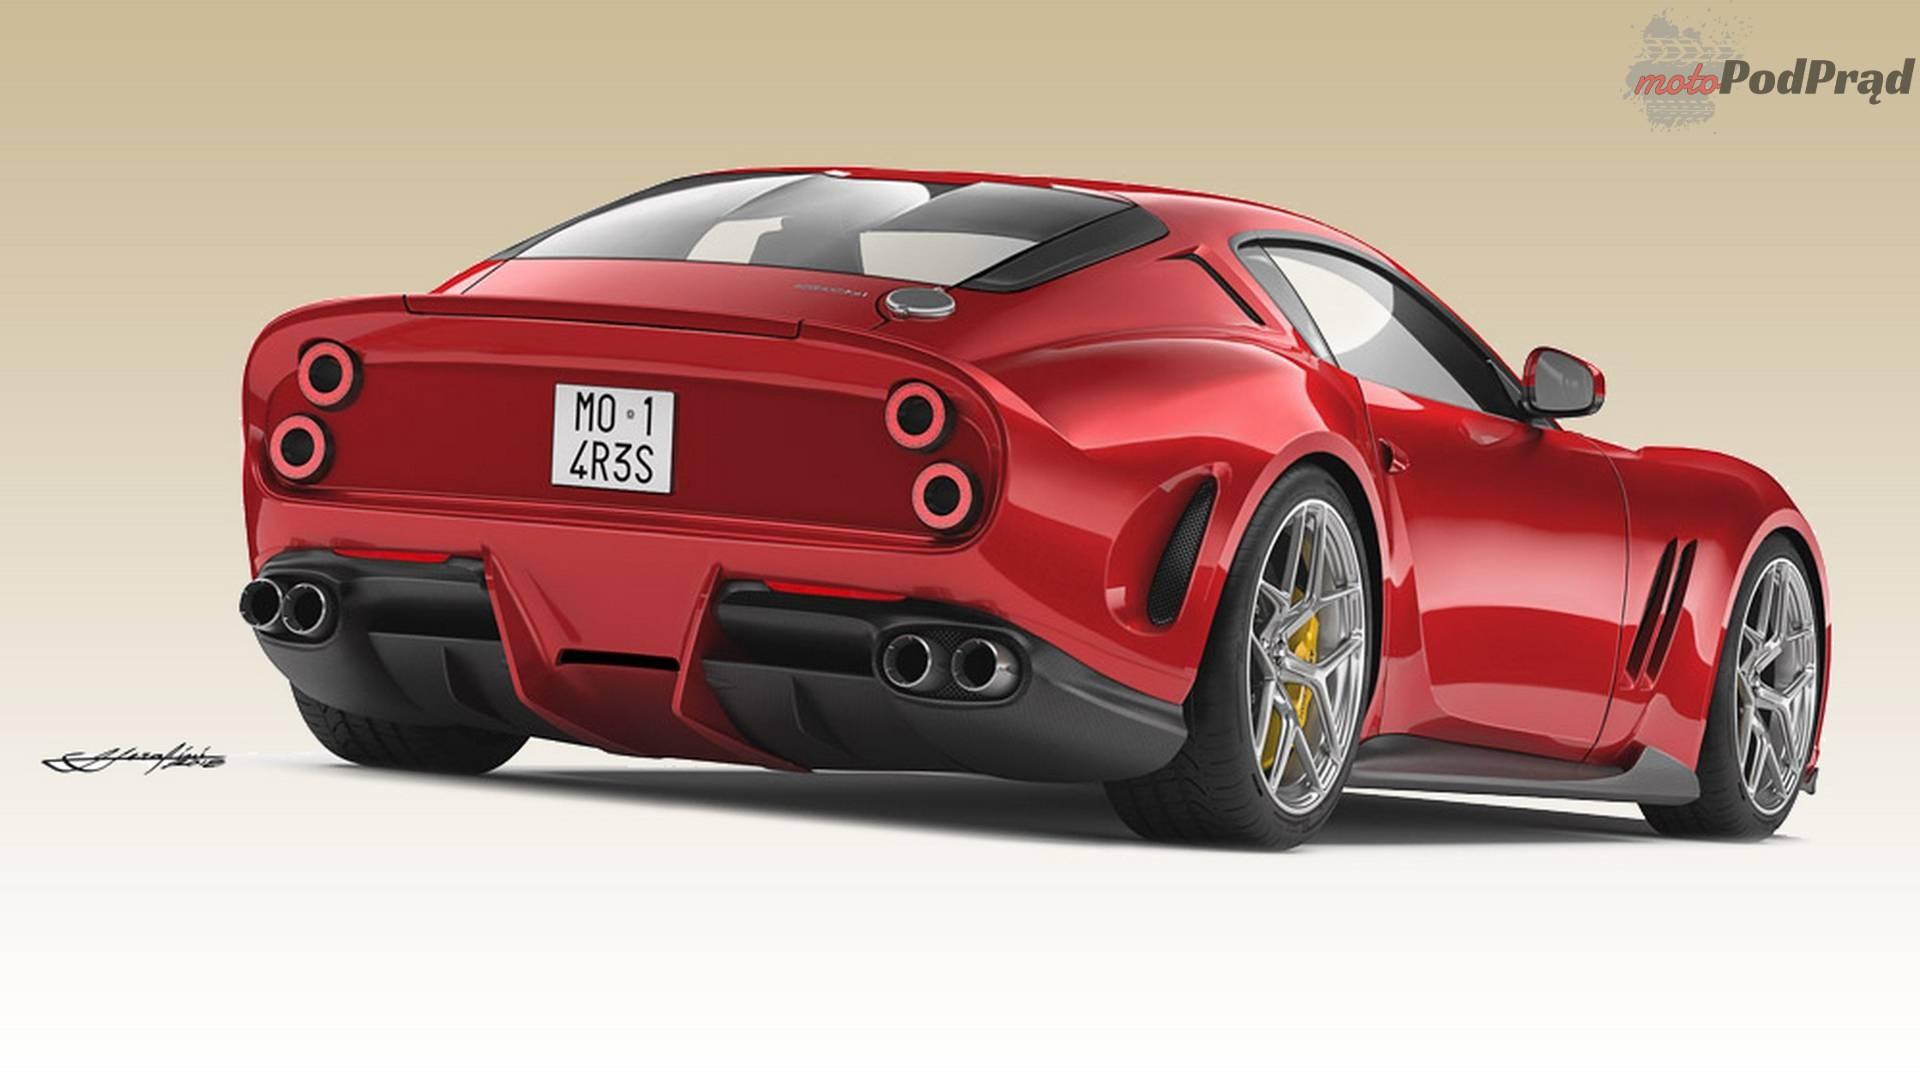 ferrari 812 superfast based 250 gto by ares design 1 Reiknarnacja GTO, której Ferrari nie stworzyło